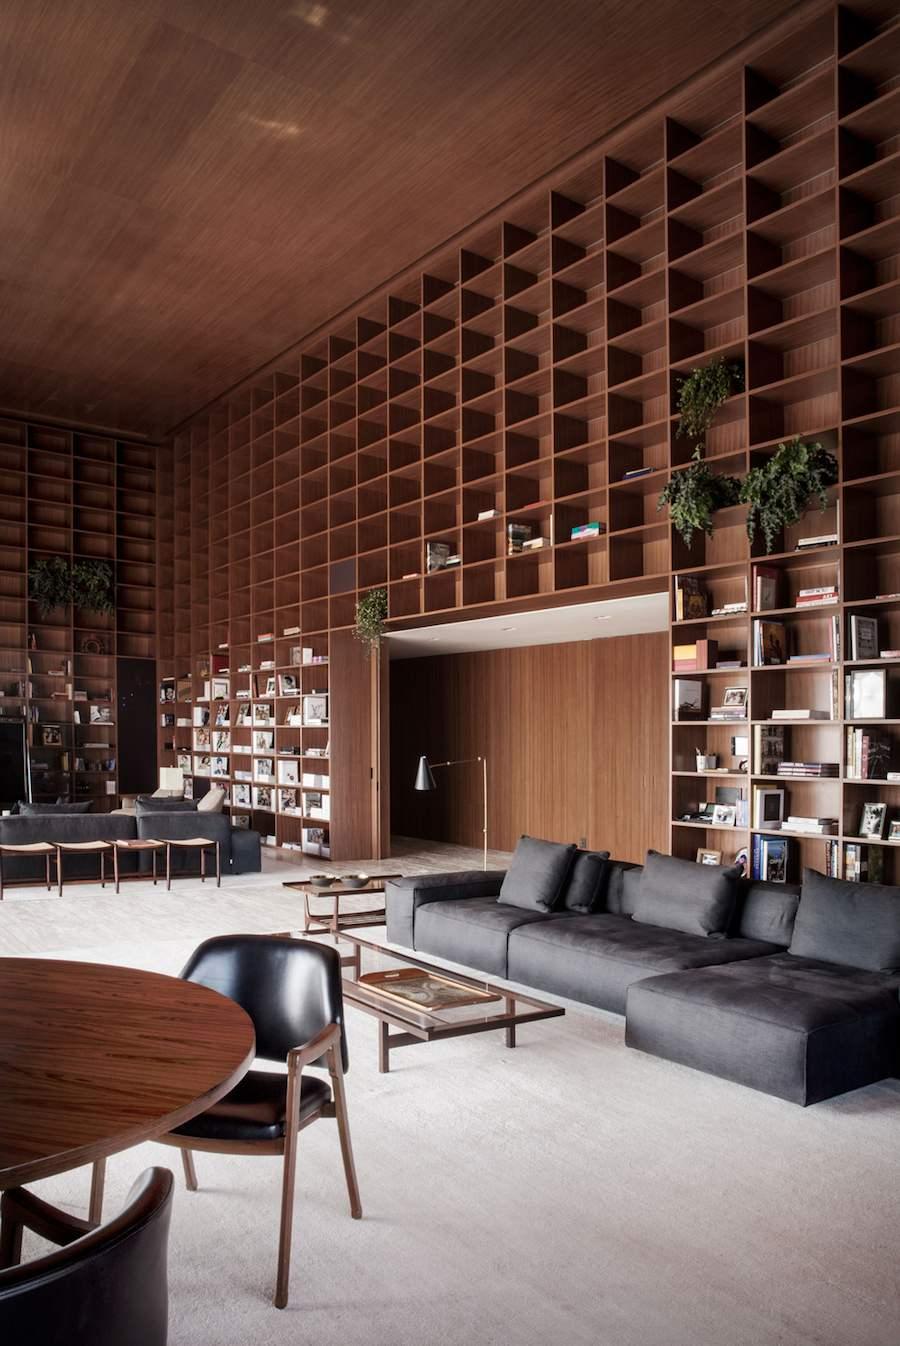 MK27's Sao Paulo penthouse. Photo by Jonas Bjerre-Poulsen - Courtesy of MK27.